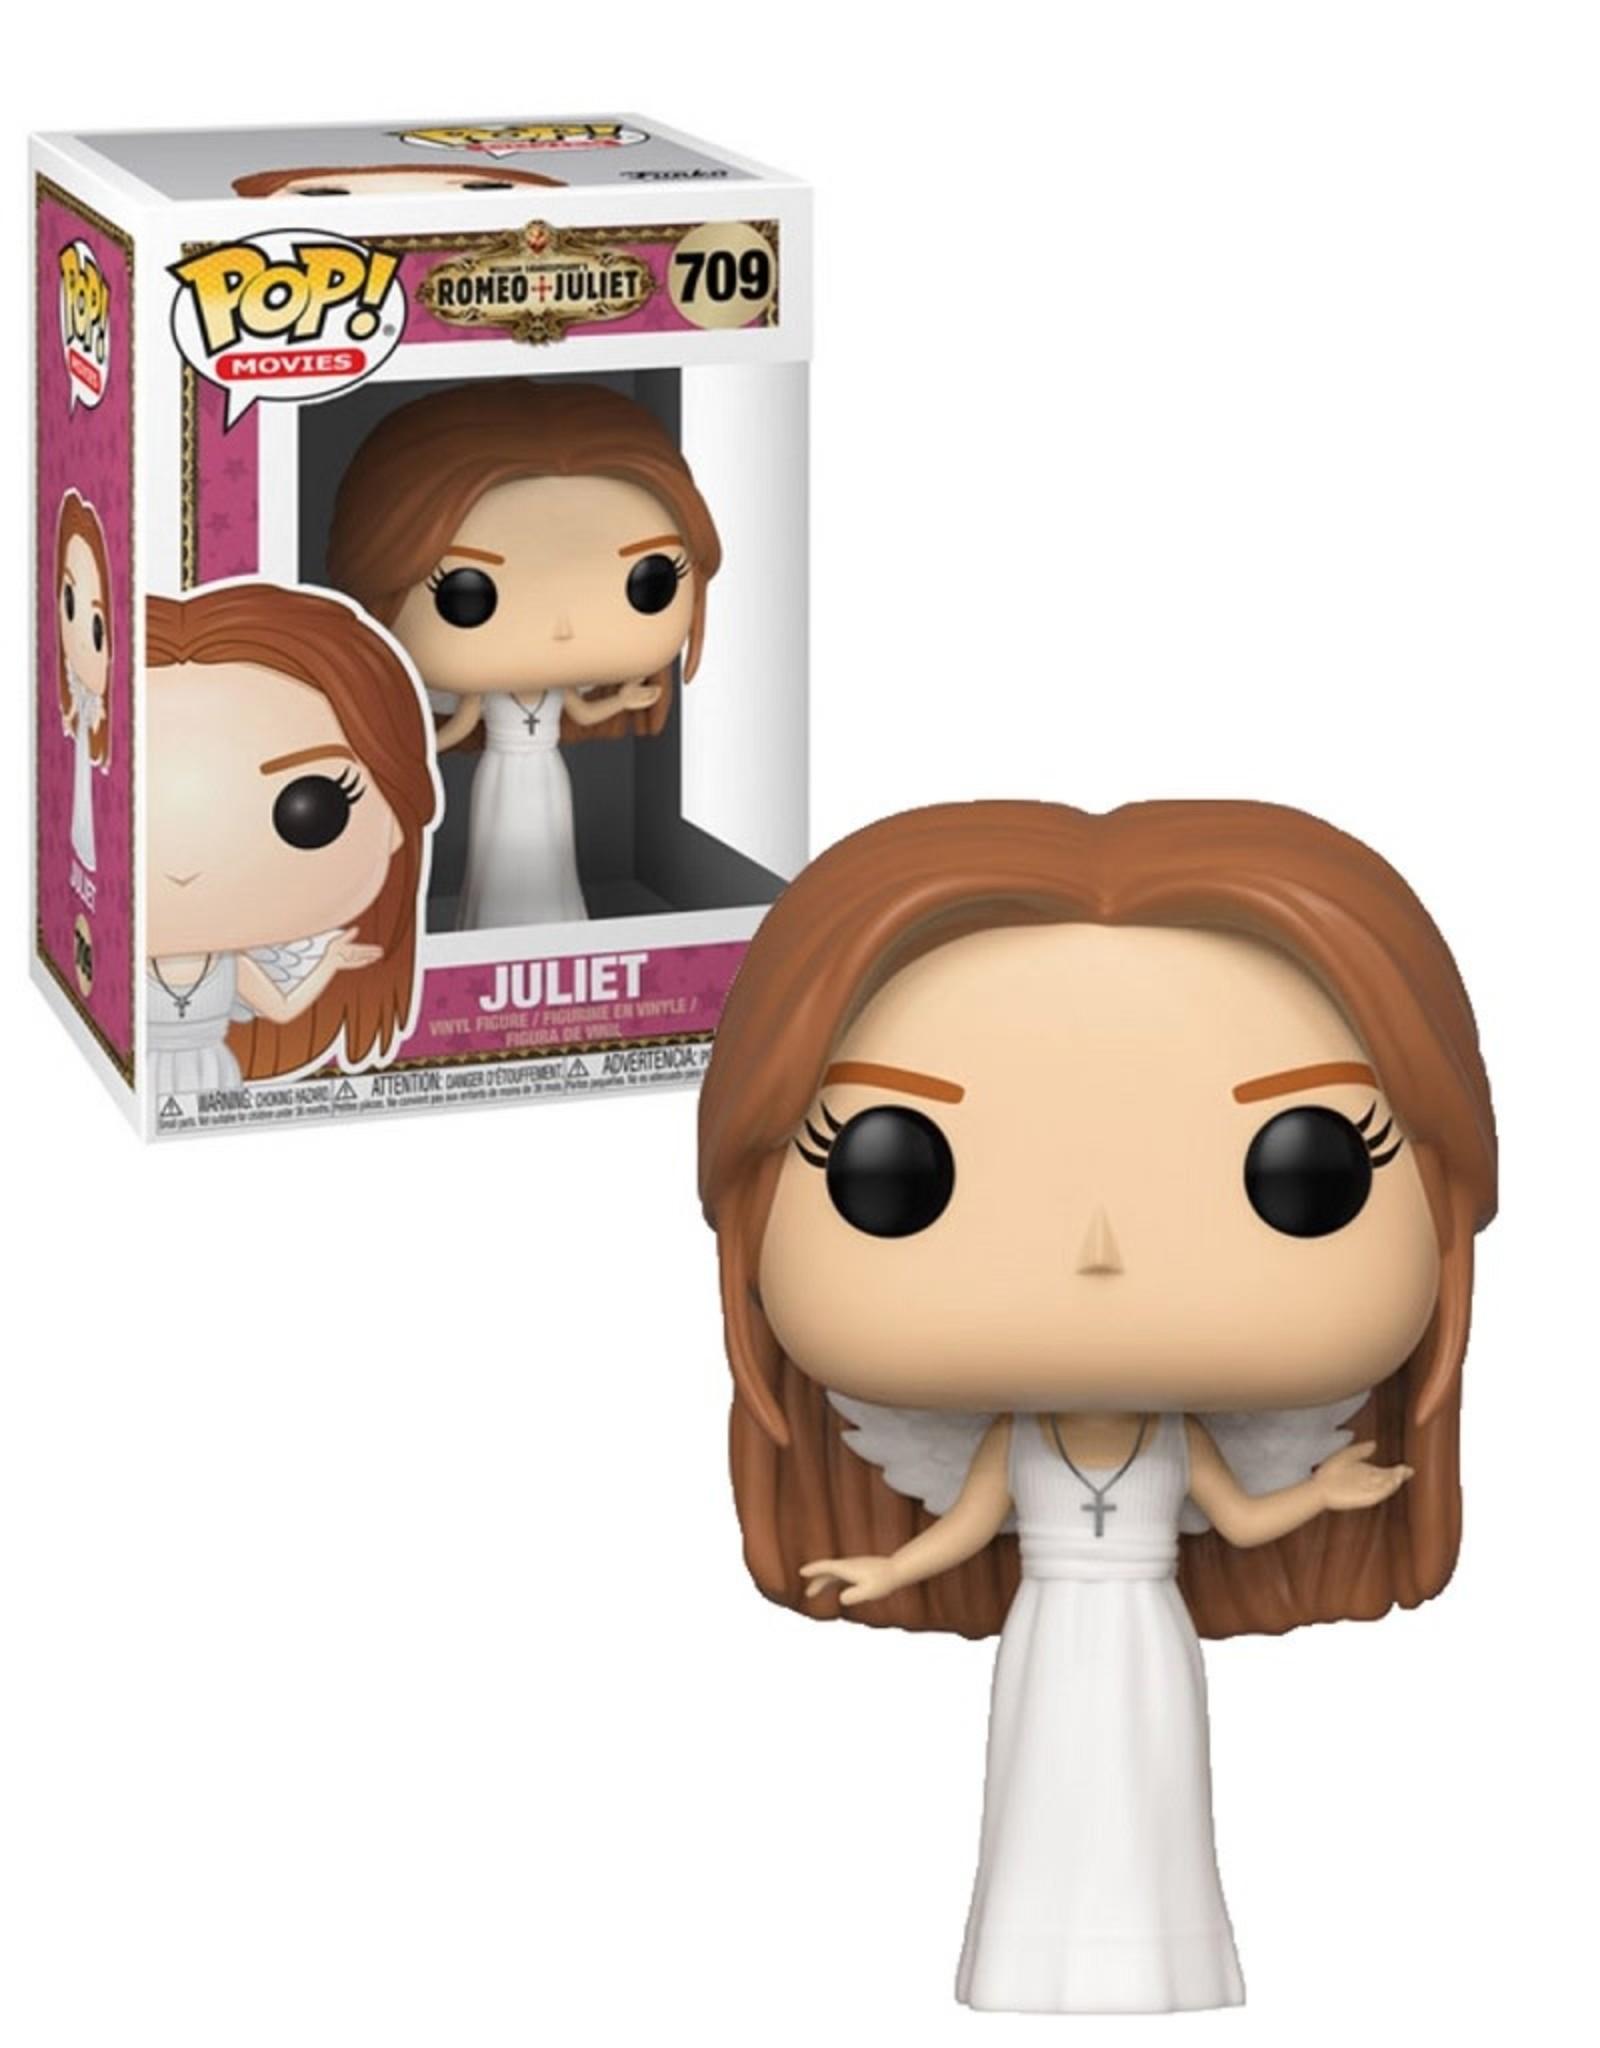 Romeo & Juliet 709 ( Funko Pop ) Juliet